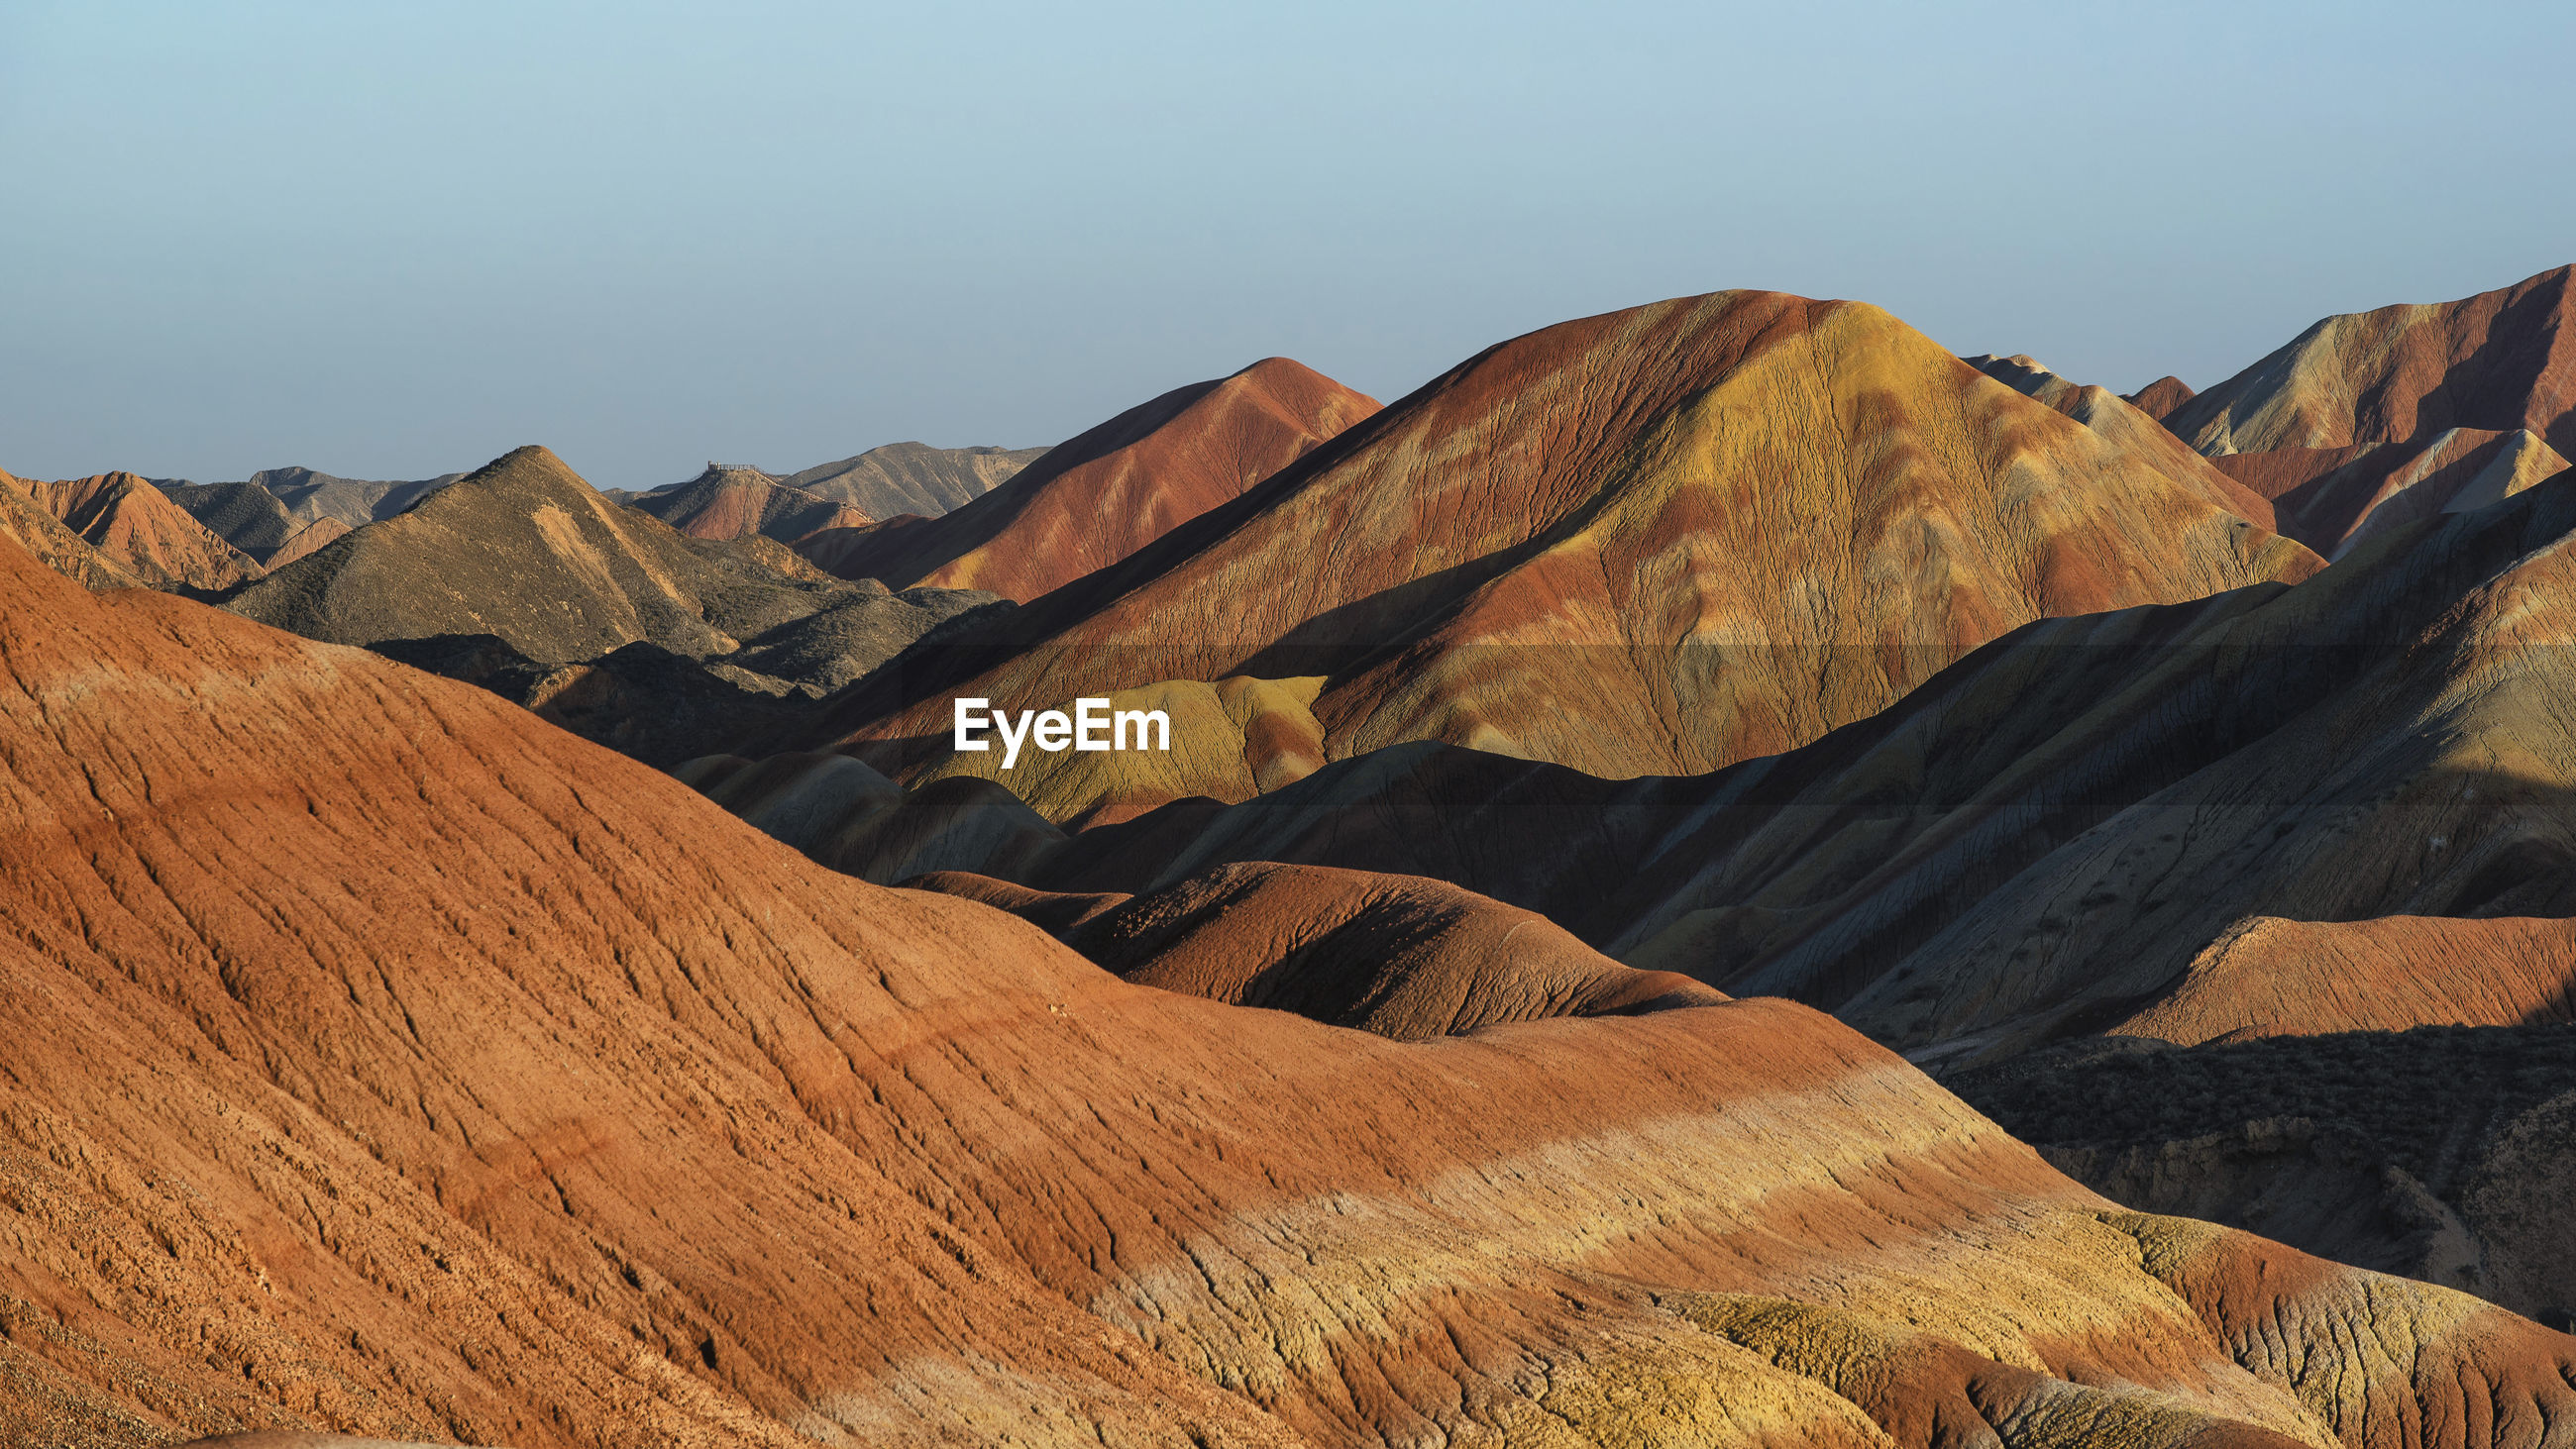 Colorful zhangye danxia national geopark or china's rainbow mountains during sunset, gansu, china